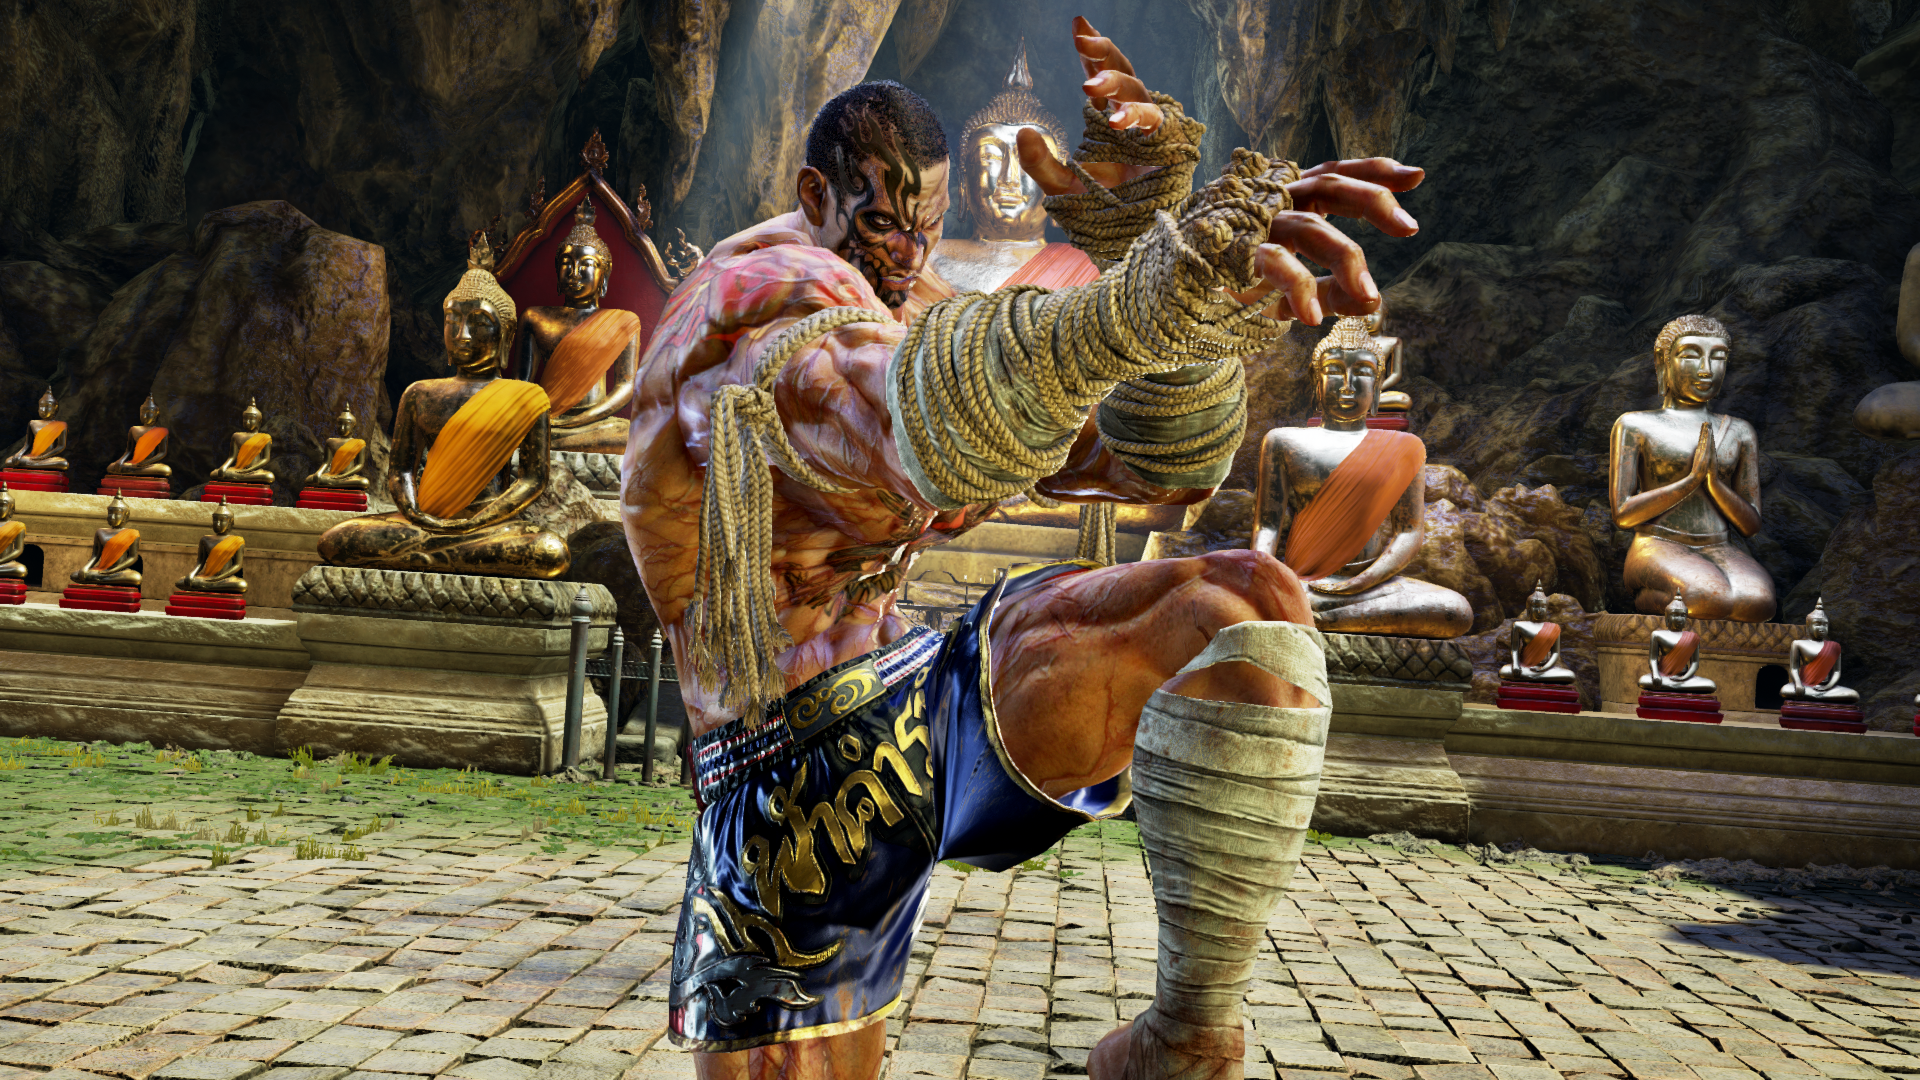 Fahkumram S Release Date Announced In A New Tekken 7 Trailer